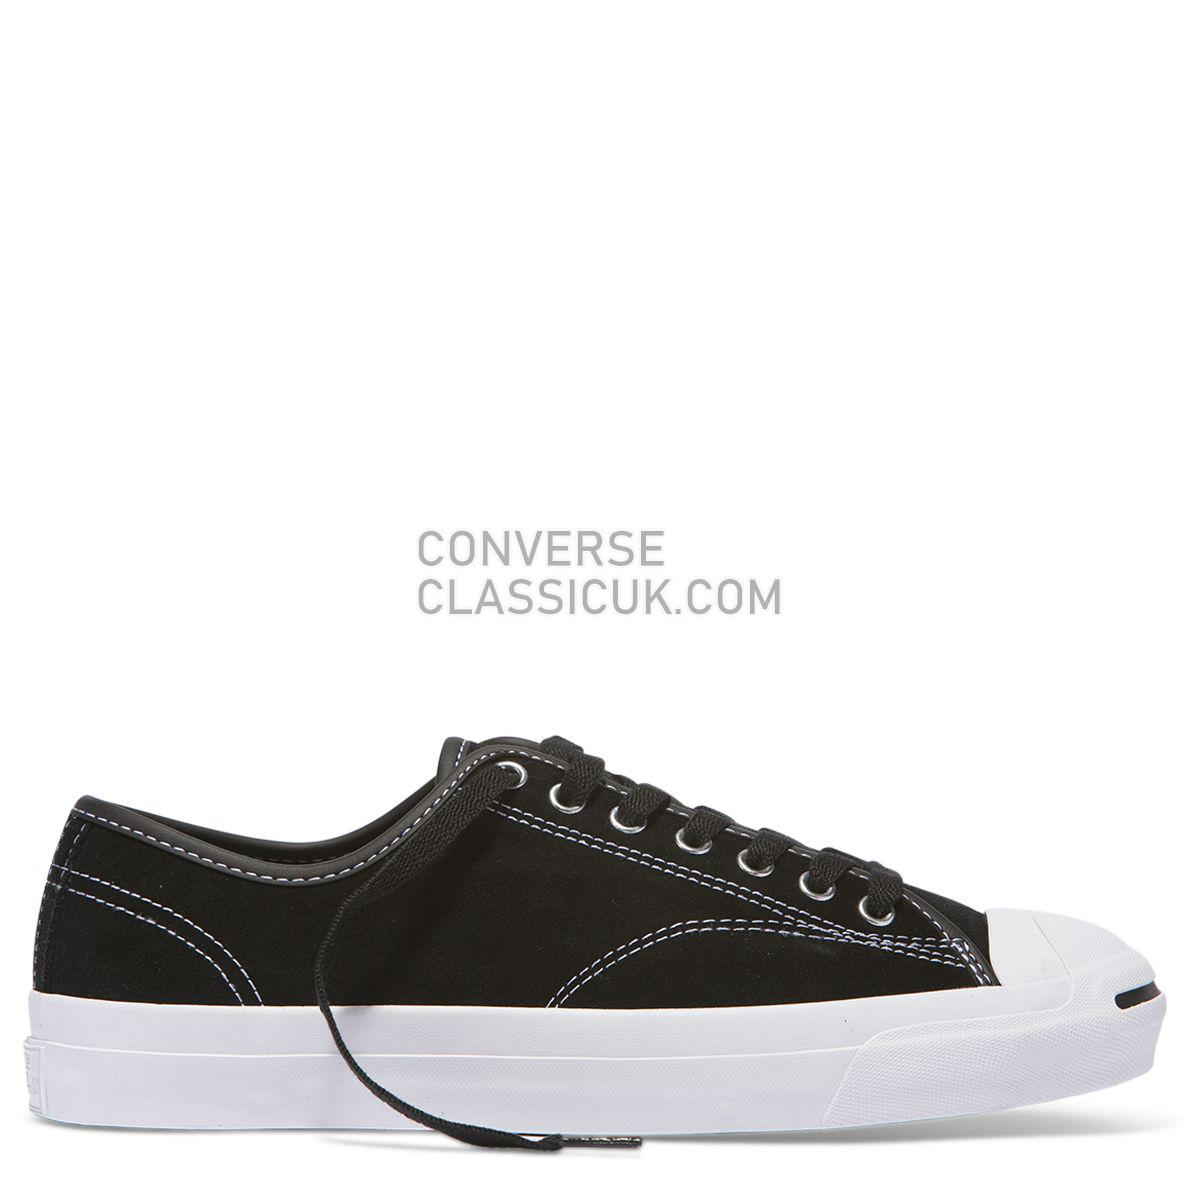 Converse Jack Purcell Pro Suede Low Top Black Mens Womens Unisex 159508 Black/Black/White Shoes